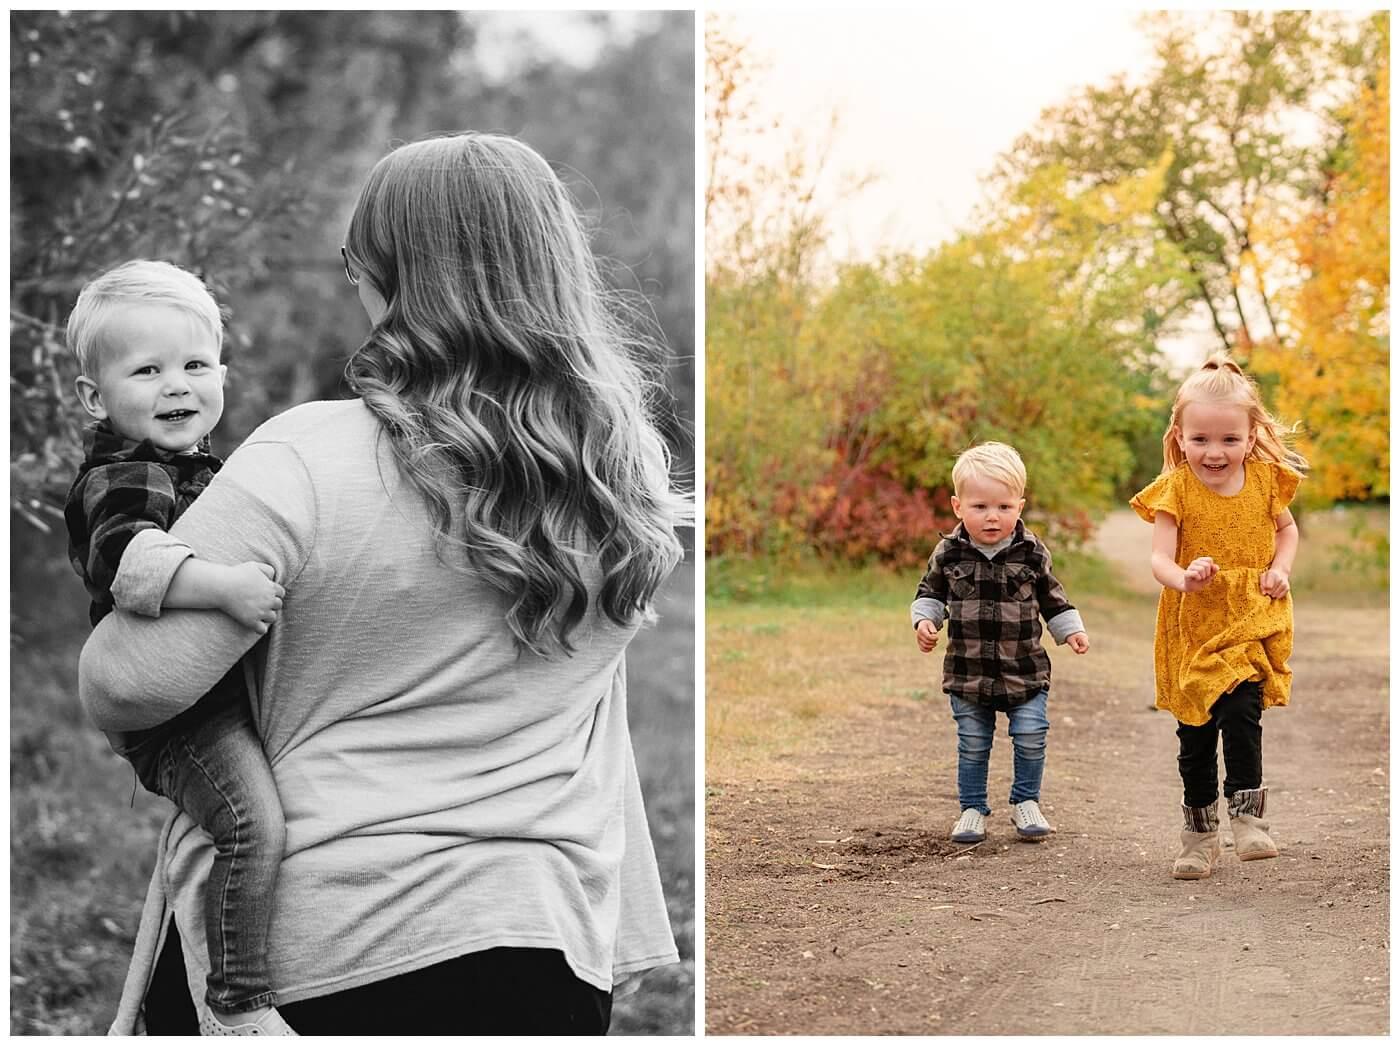 Liske Family 2020 - Science Centre - 010 - Cute jog